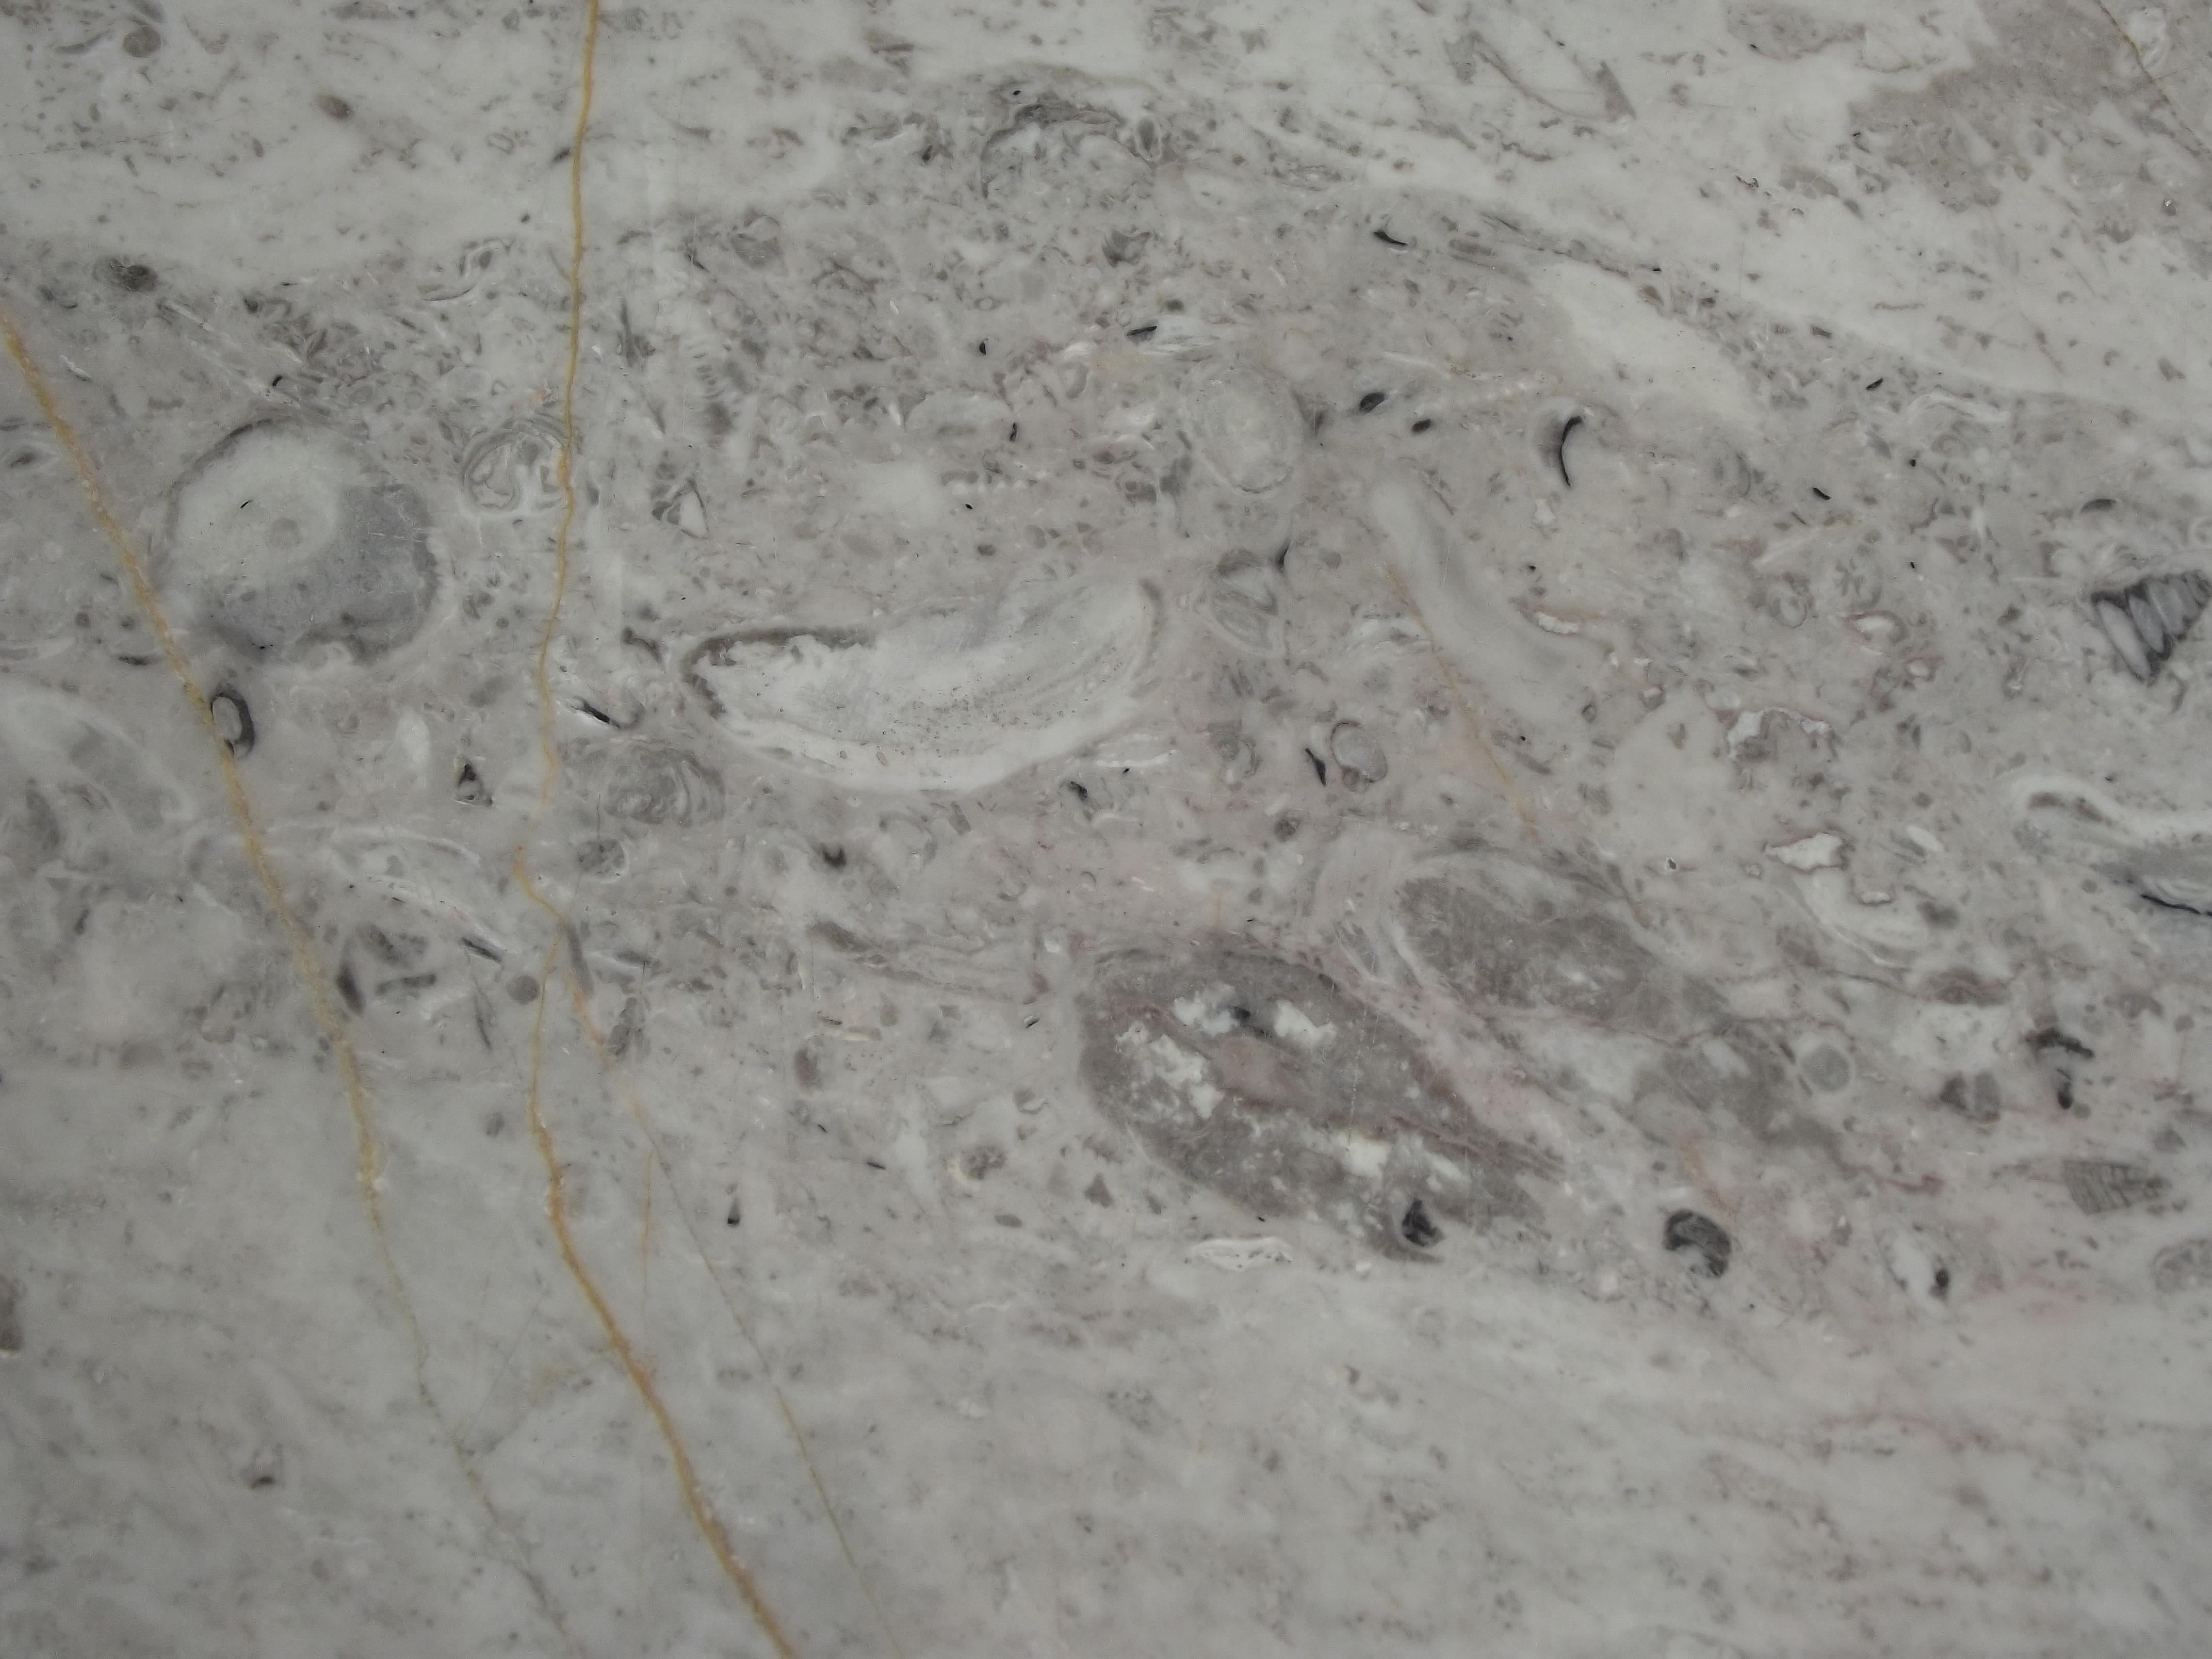 File piso de m rmol jpg wikimedia commons - Tipos de marmol ...